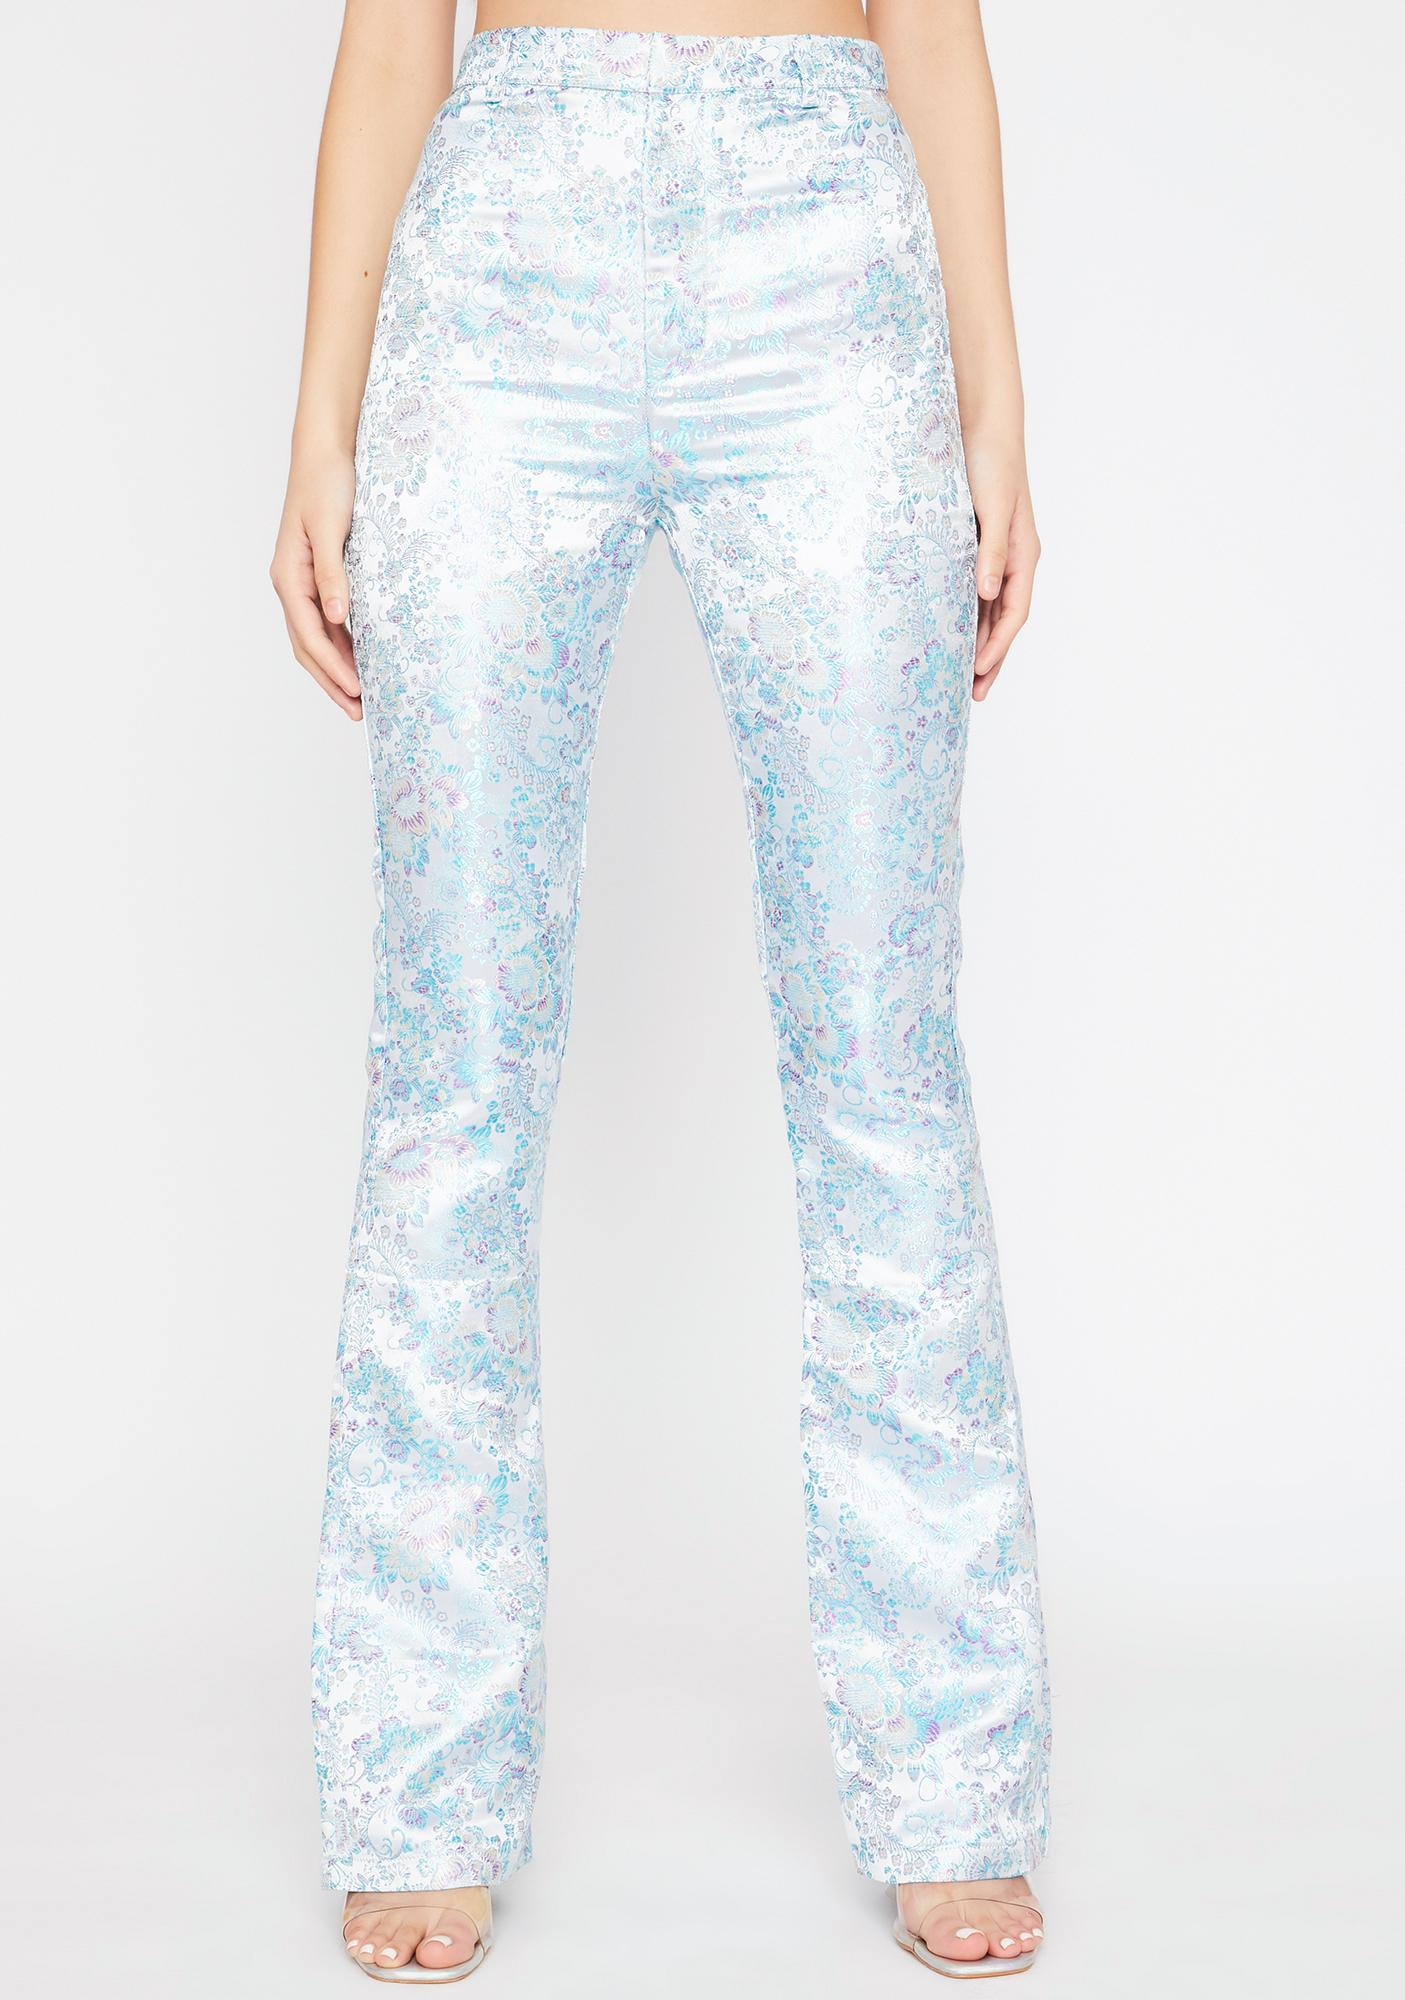 Platinum Evening Shadows Brocade Pants